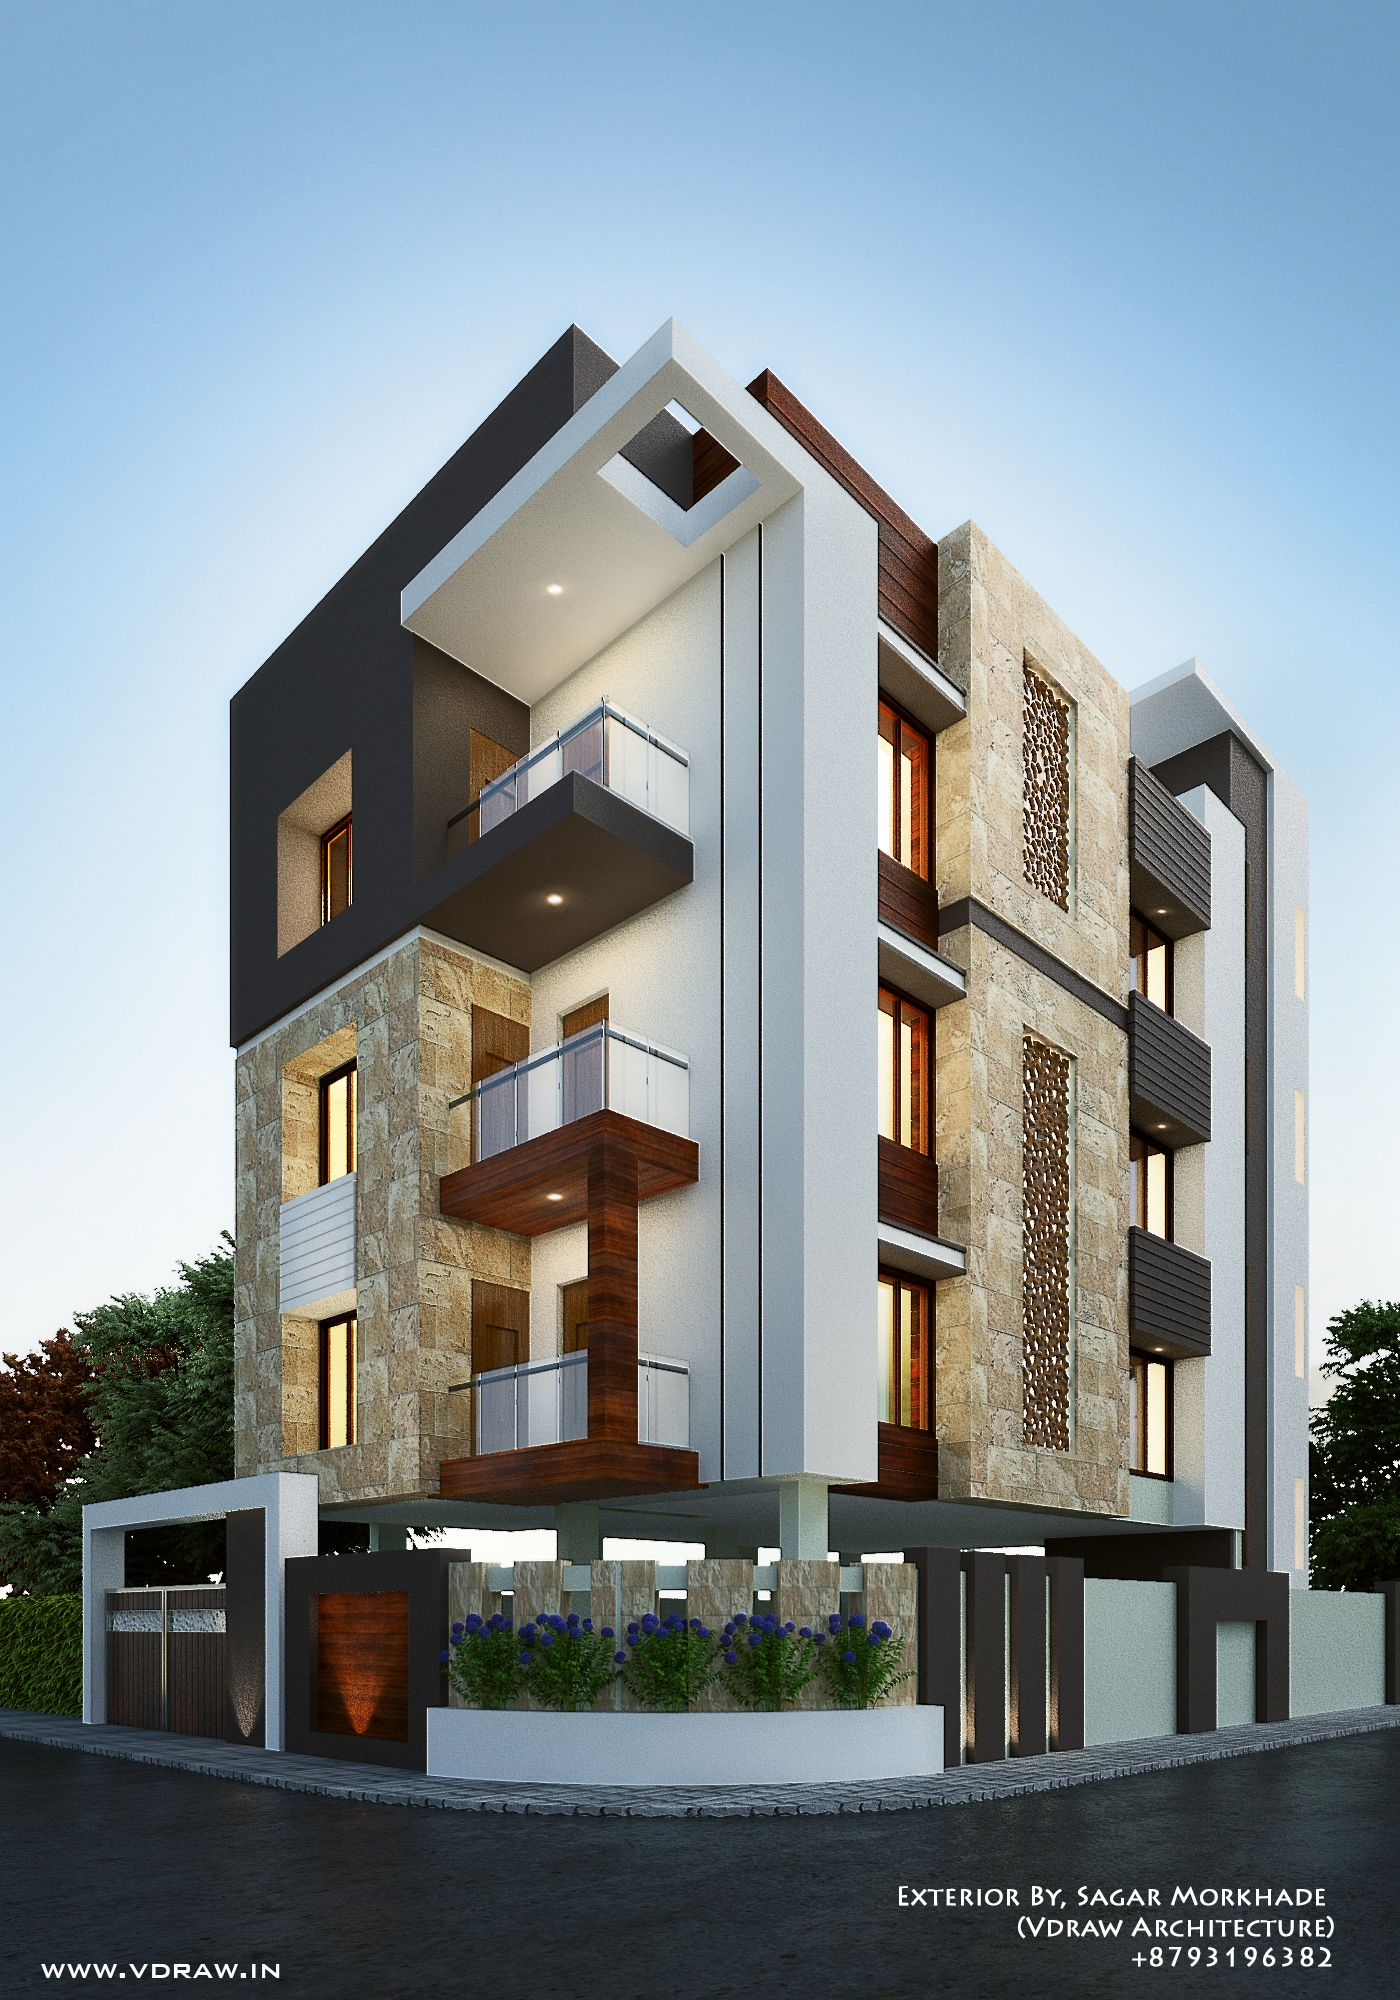 Exterior Sagar Morkhade Vdraw Architecture